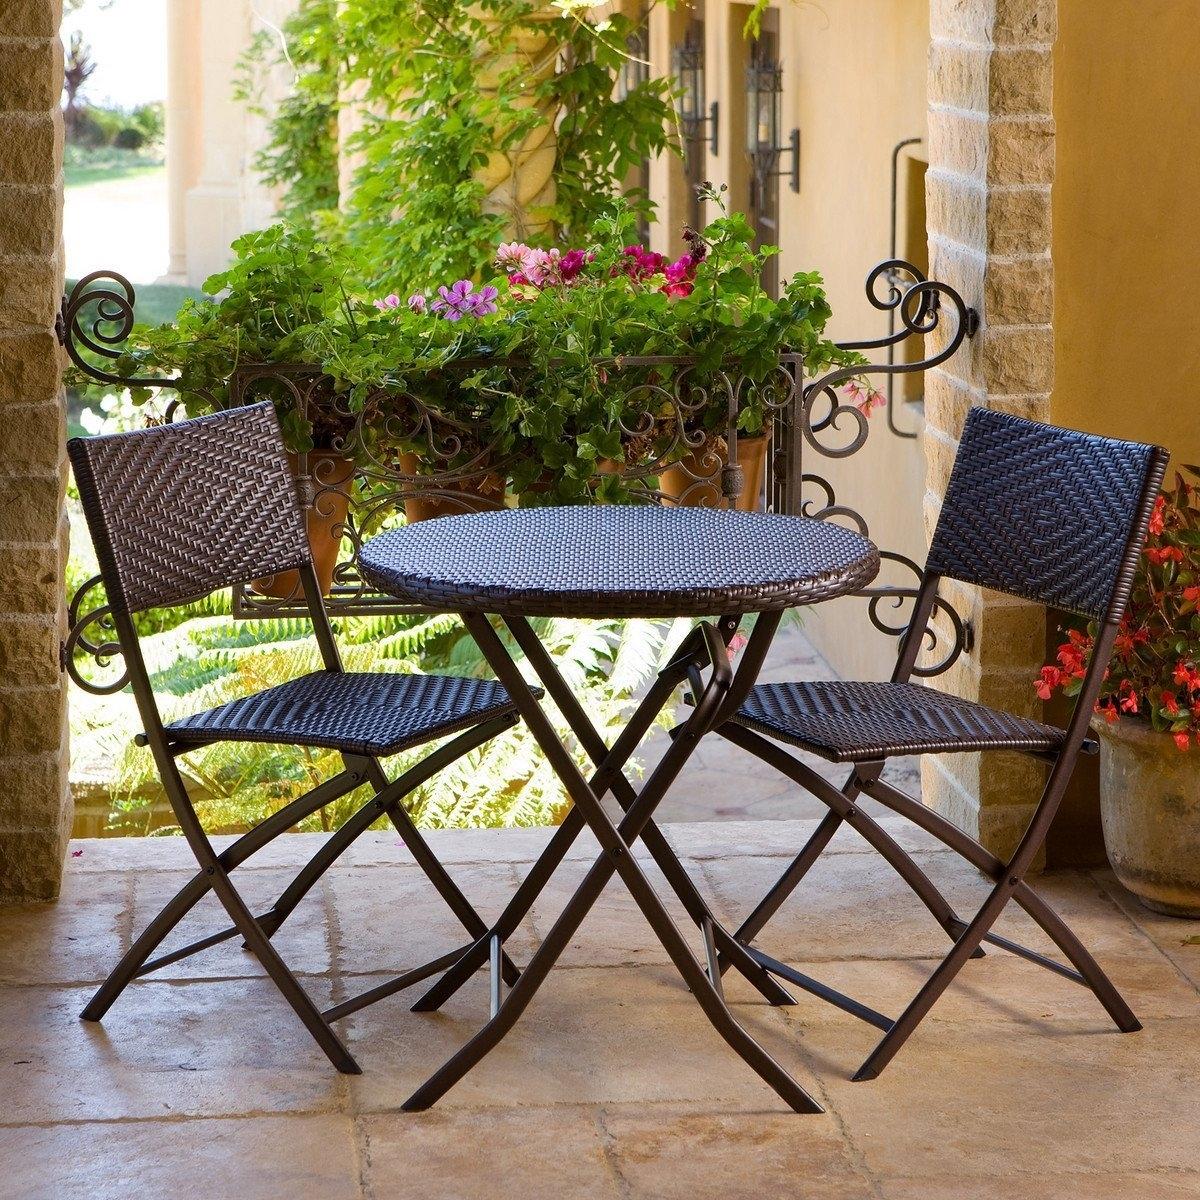 bistro patio set 3 piece outdoor bistro patio furniture set in espresso SOANLOW